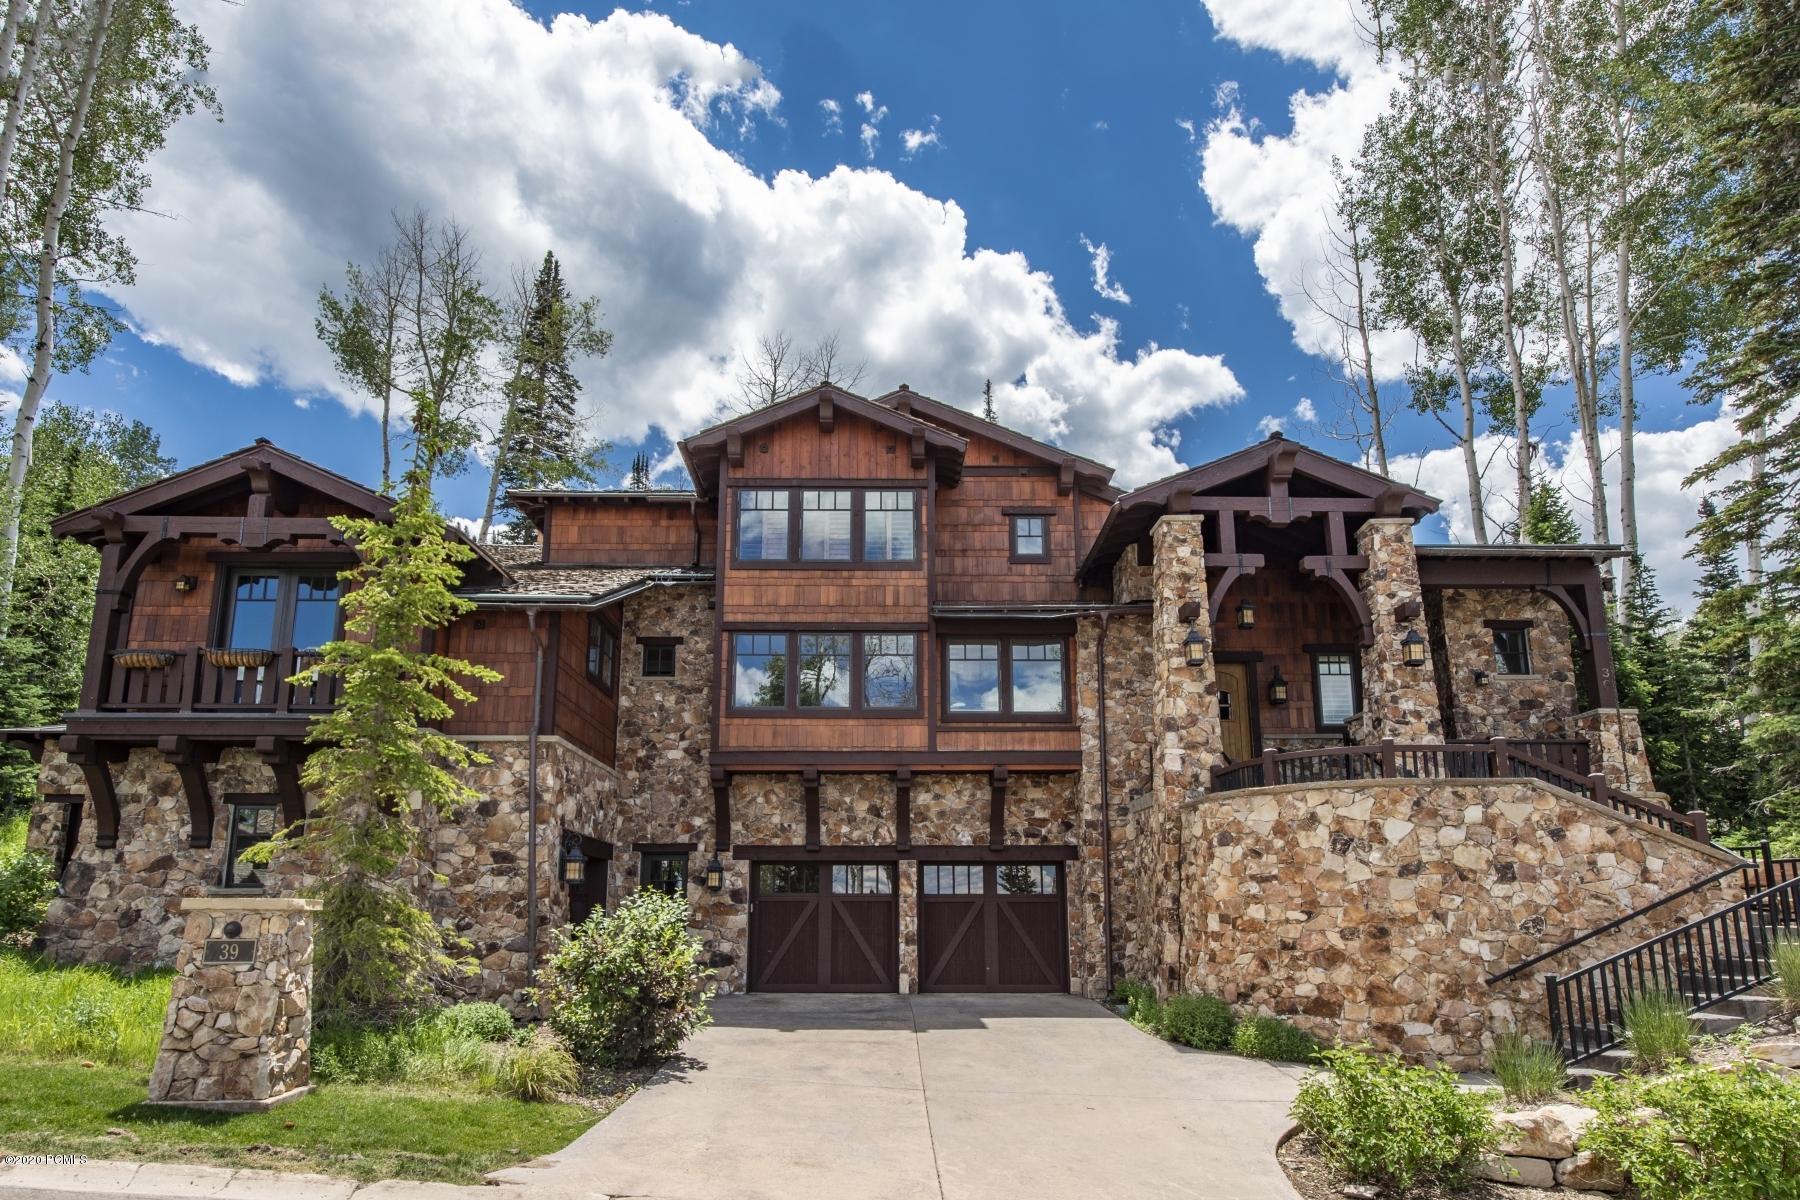 39 Silver Strike Trail, Park City, Utah 84060, 5 Bedrooms Bedrooms, ,6 BathroomsBathrooms,Single Family,For Sale,Silver Strike,20190109112430415765000000